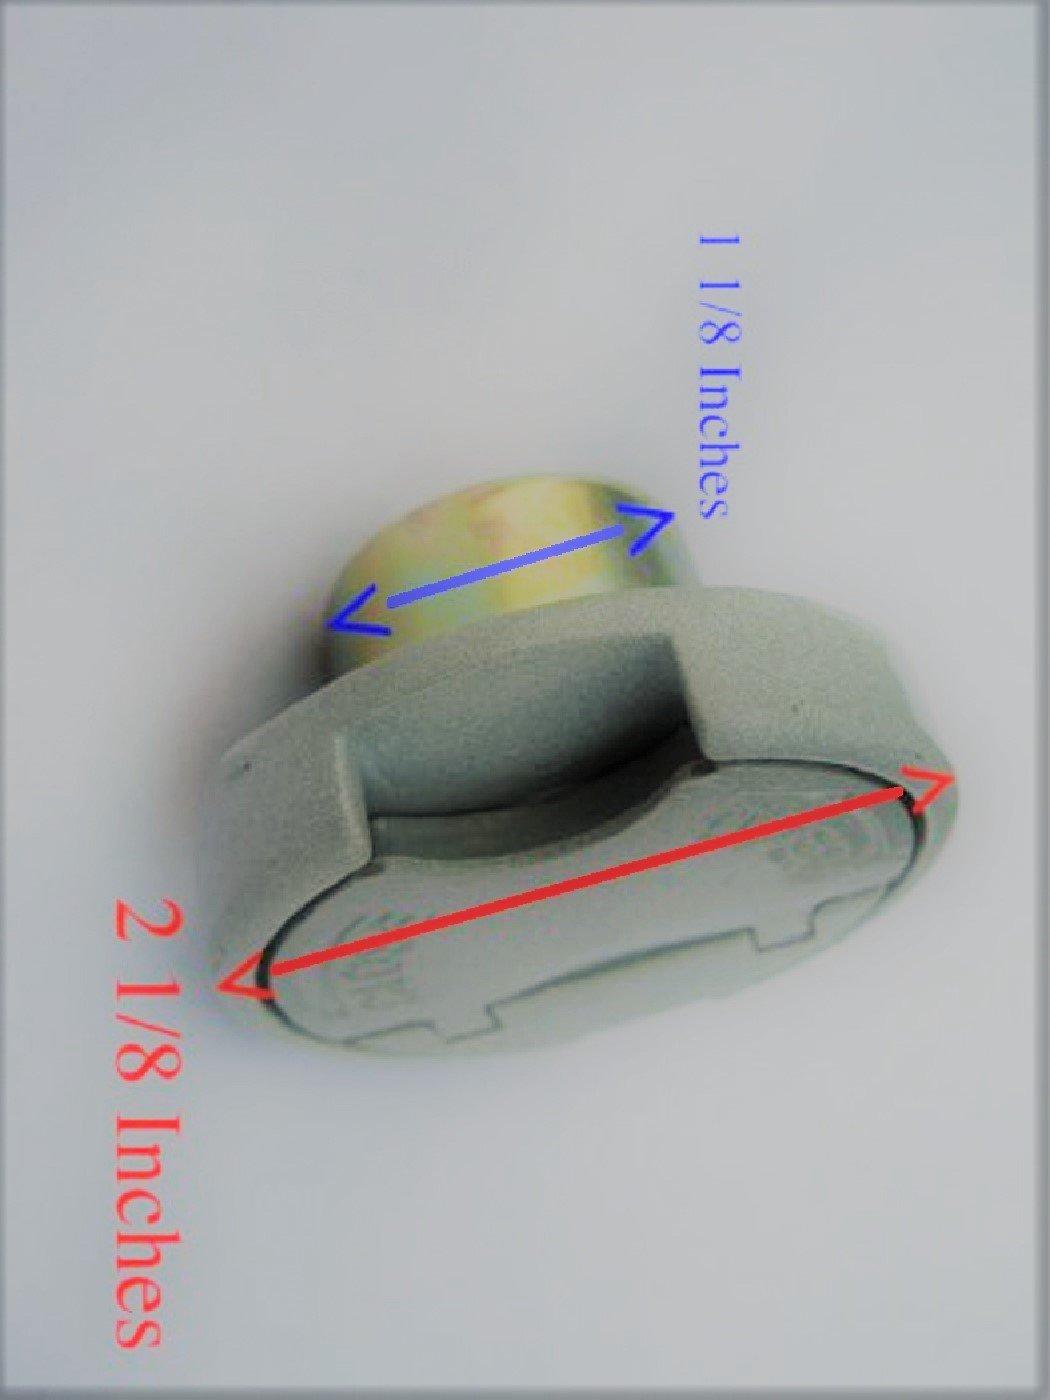 Scooter Key Ignition Switch Set For 49 50 Cc Taotao Qlink Gy6 50cc Wiring Diagram Peace Roketa Jonway Nst Tank Automotive